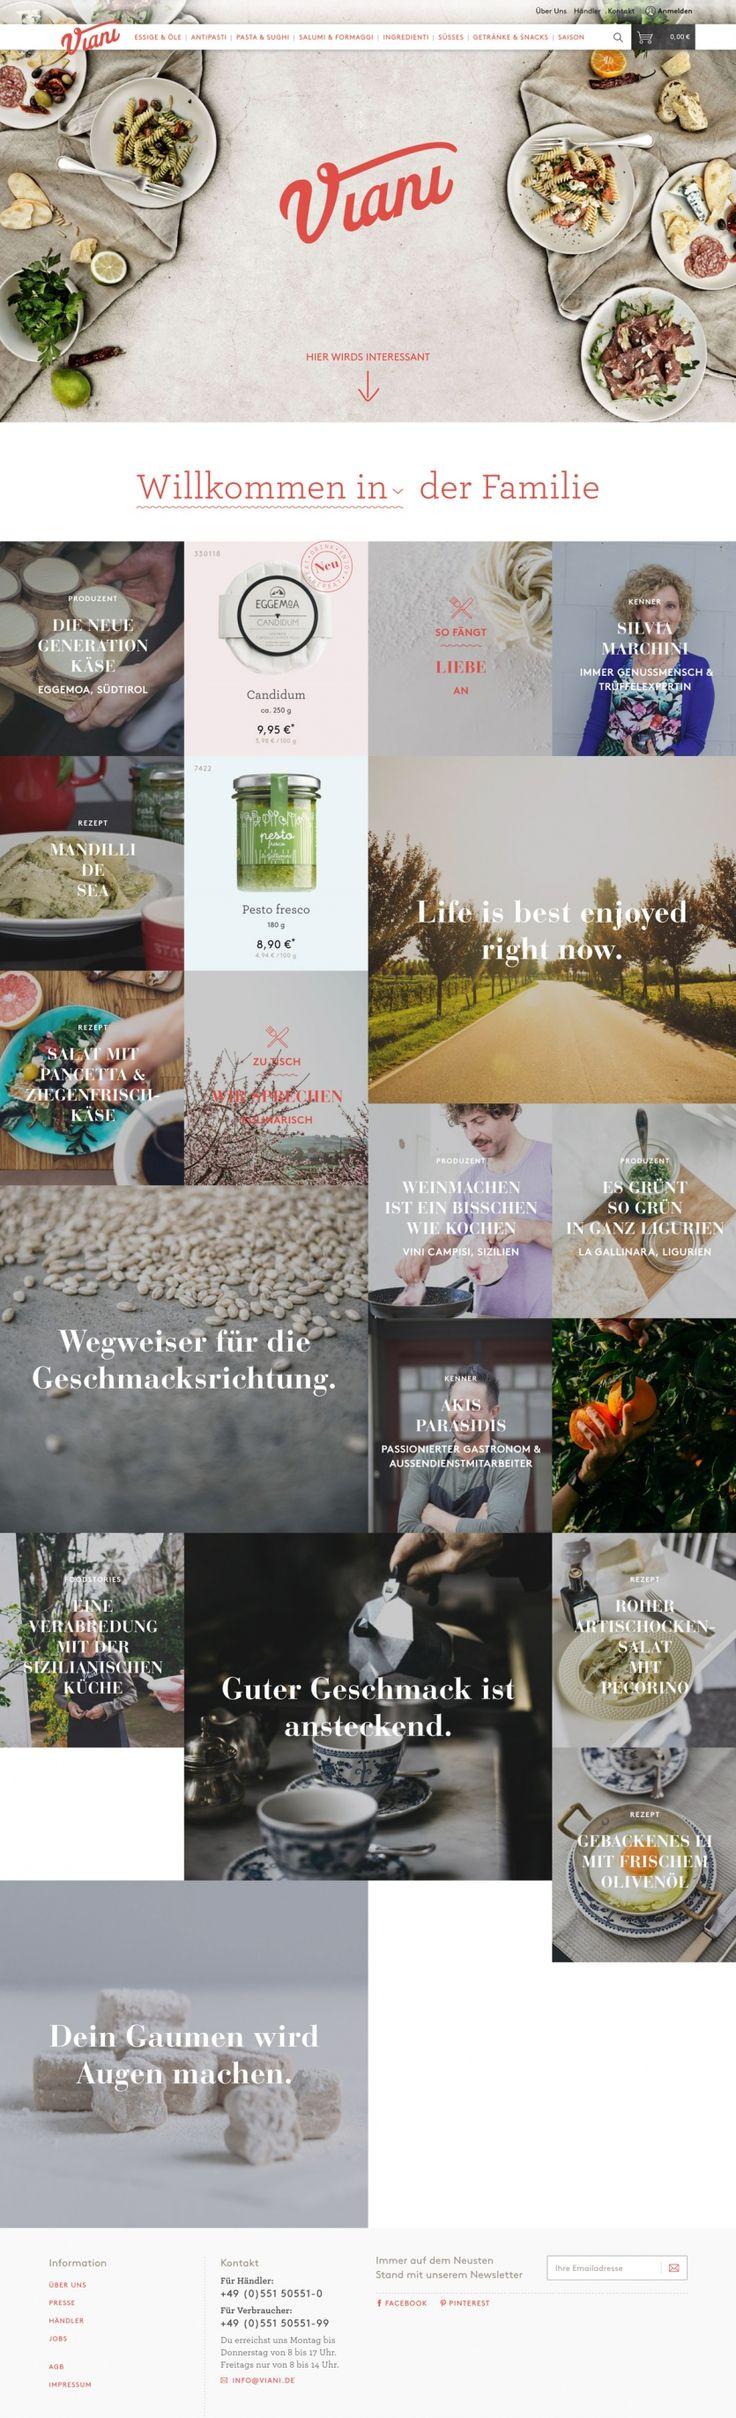 Viani - Mindsparkle Mag #Webdesign @English4Matura